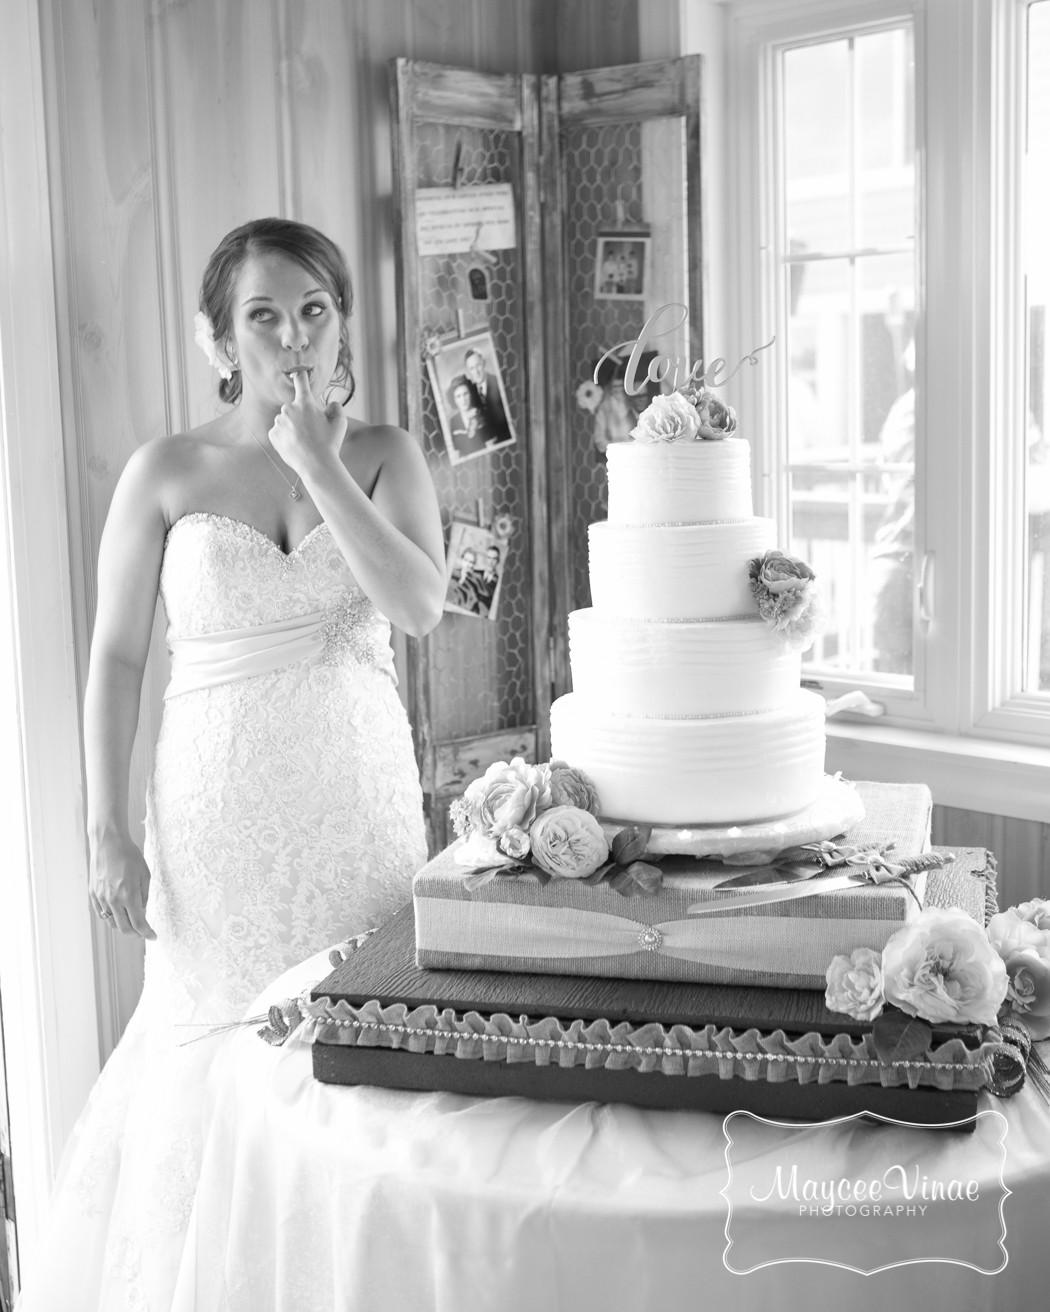 Wedding Cakes Fargo Nd  57 Fargo ND Moorhead MN Aberdeen SD traveling surround